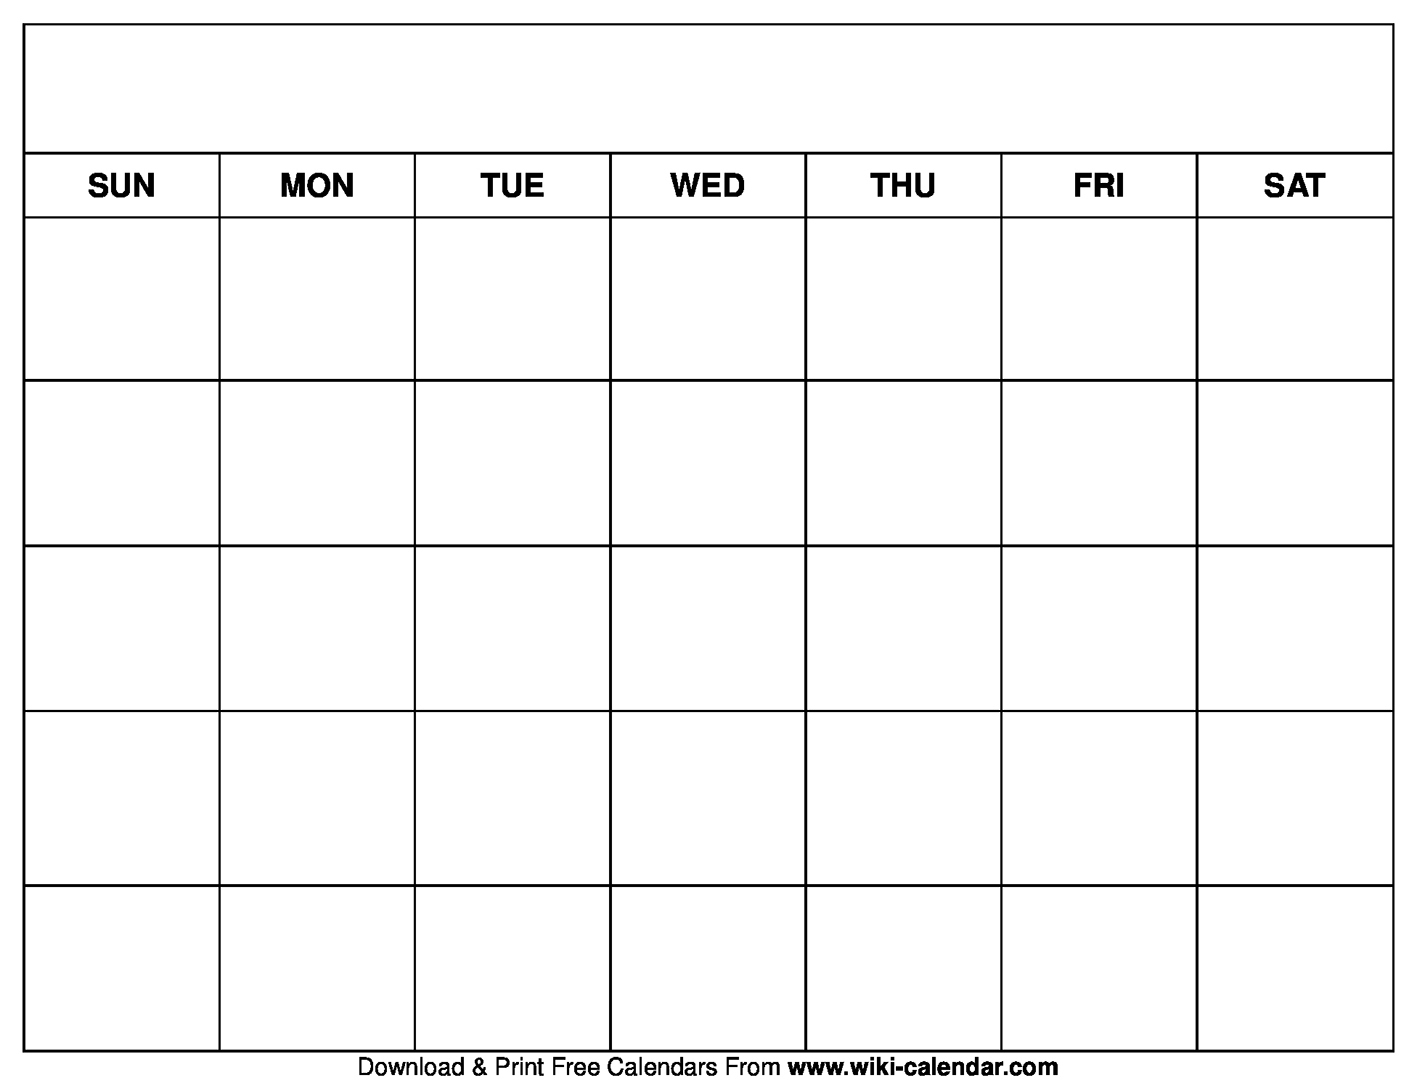 Catch Blank Calendar Weekdays Only